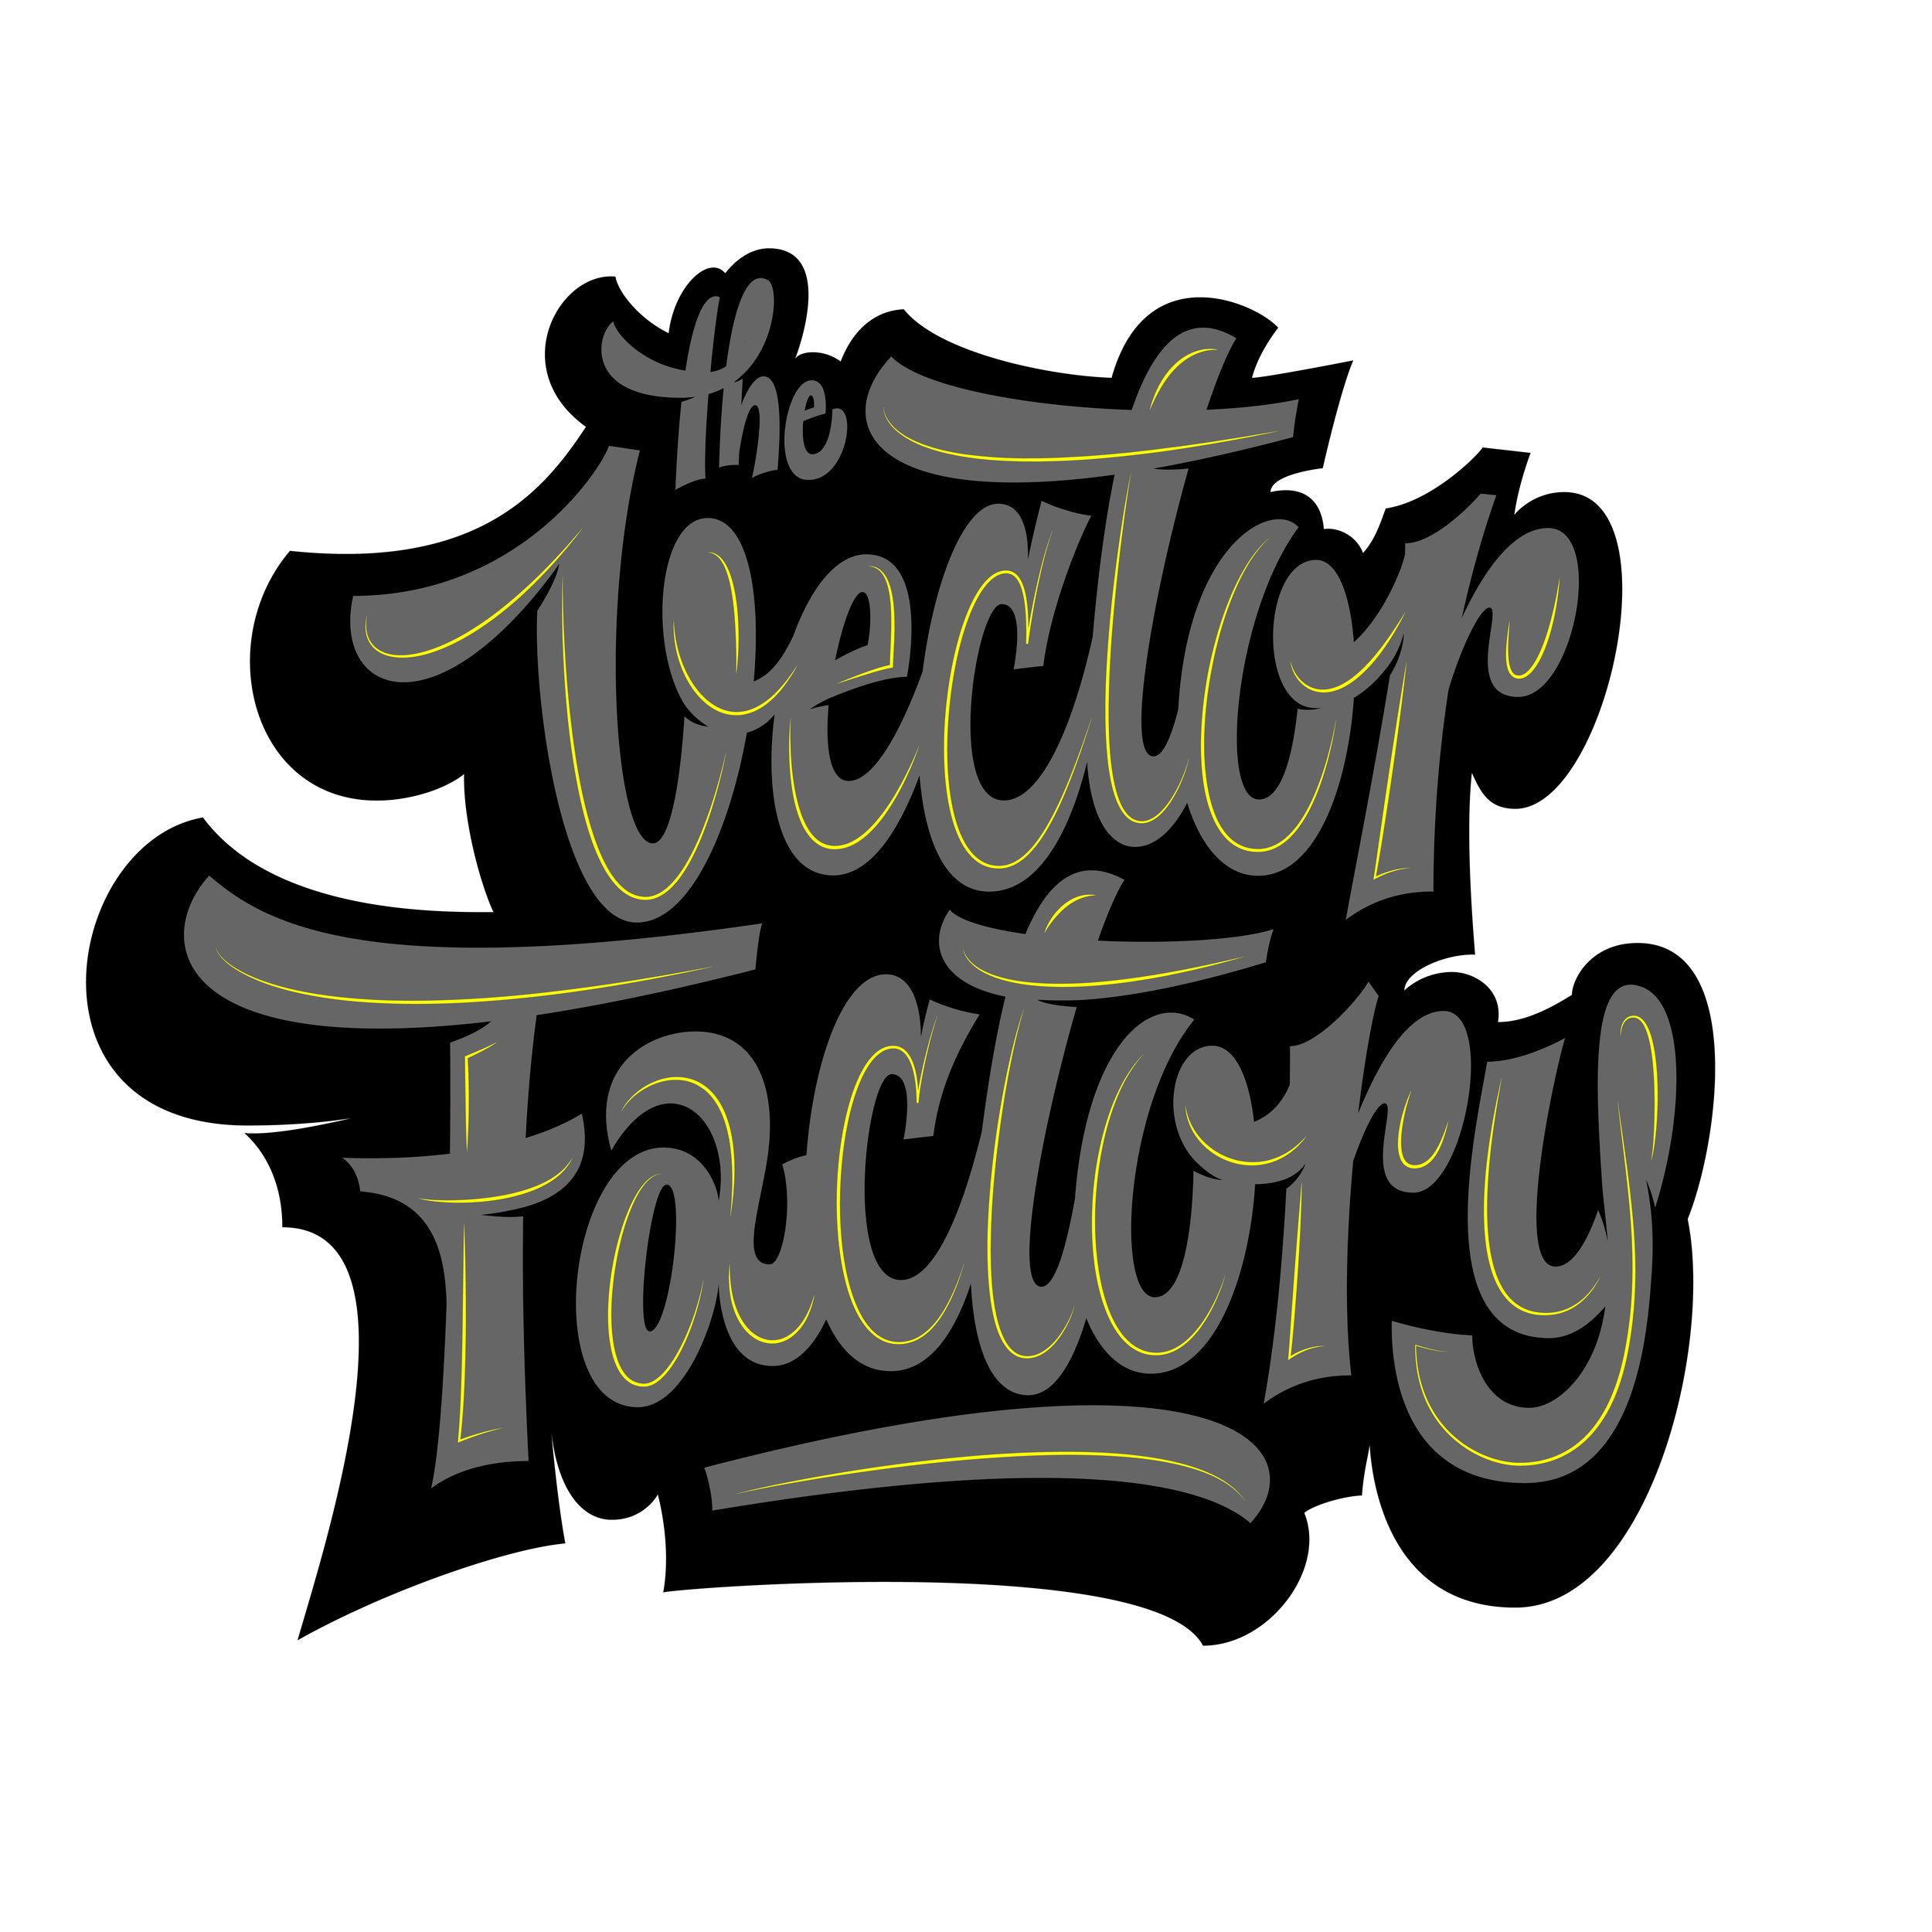 The-Vector-Factory-Grey.jpg